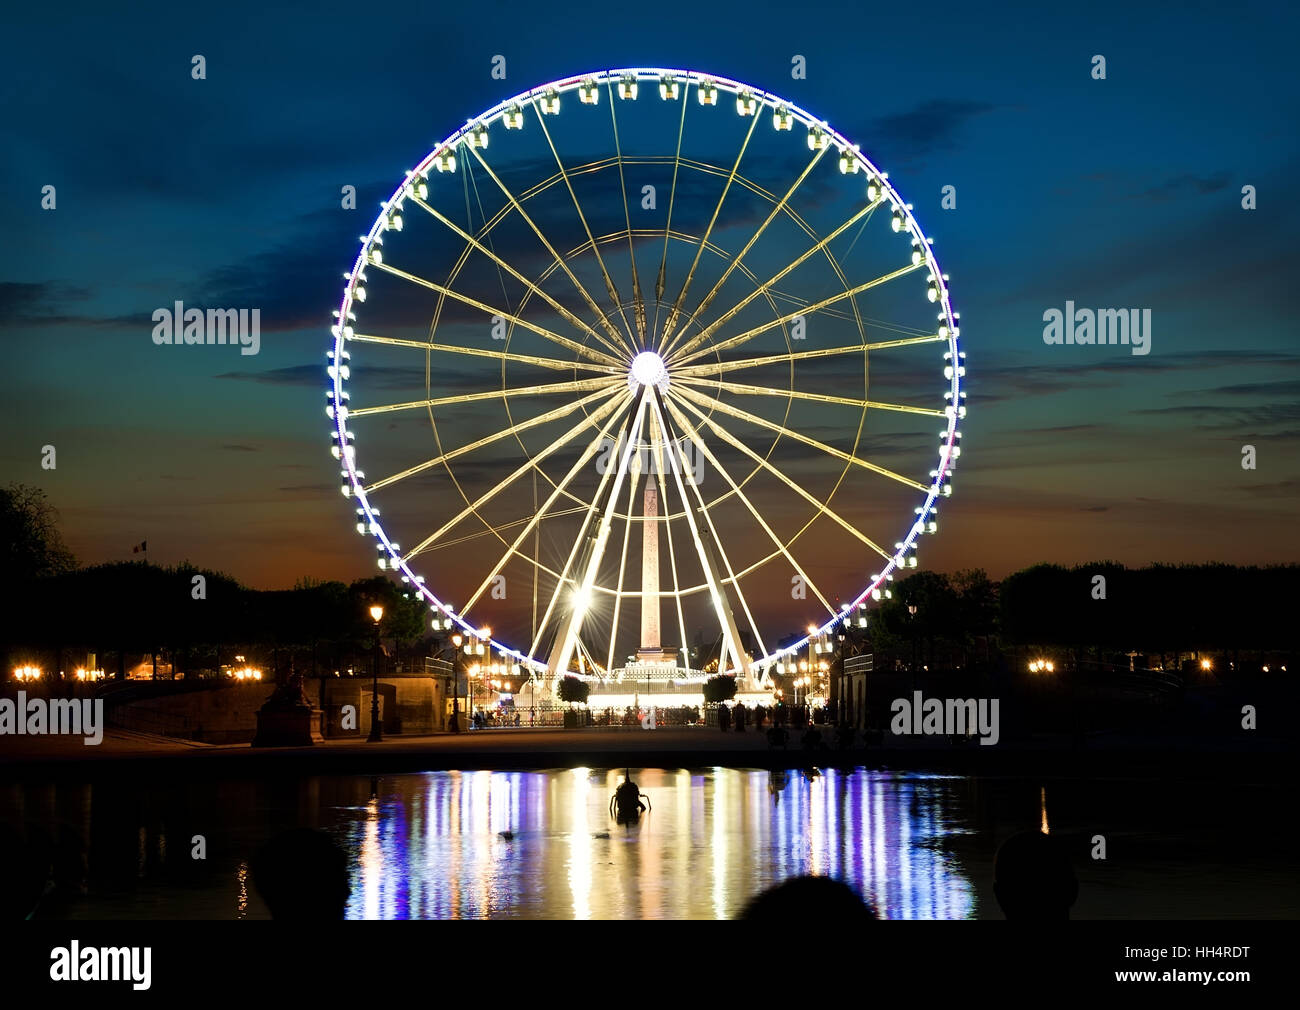 Illuminated ferris wheel and river Seine in Paris at sunset, France - Stock Image